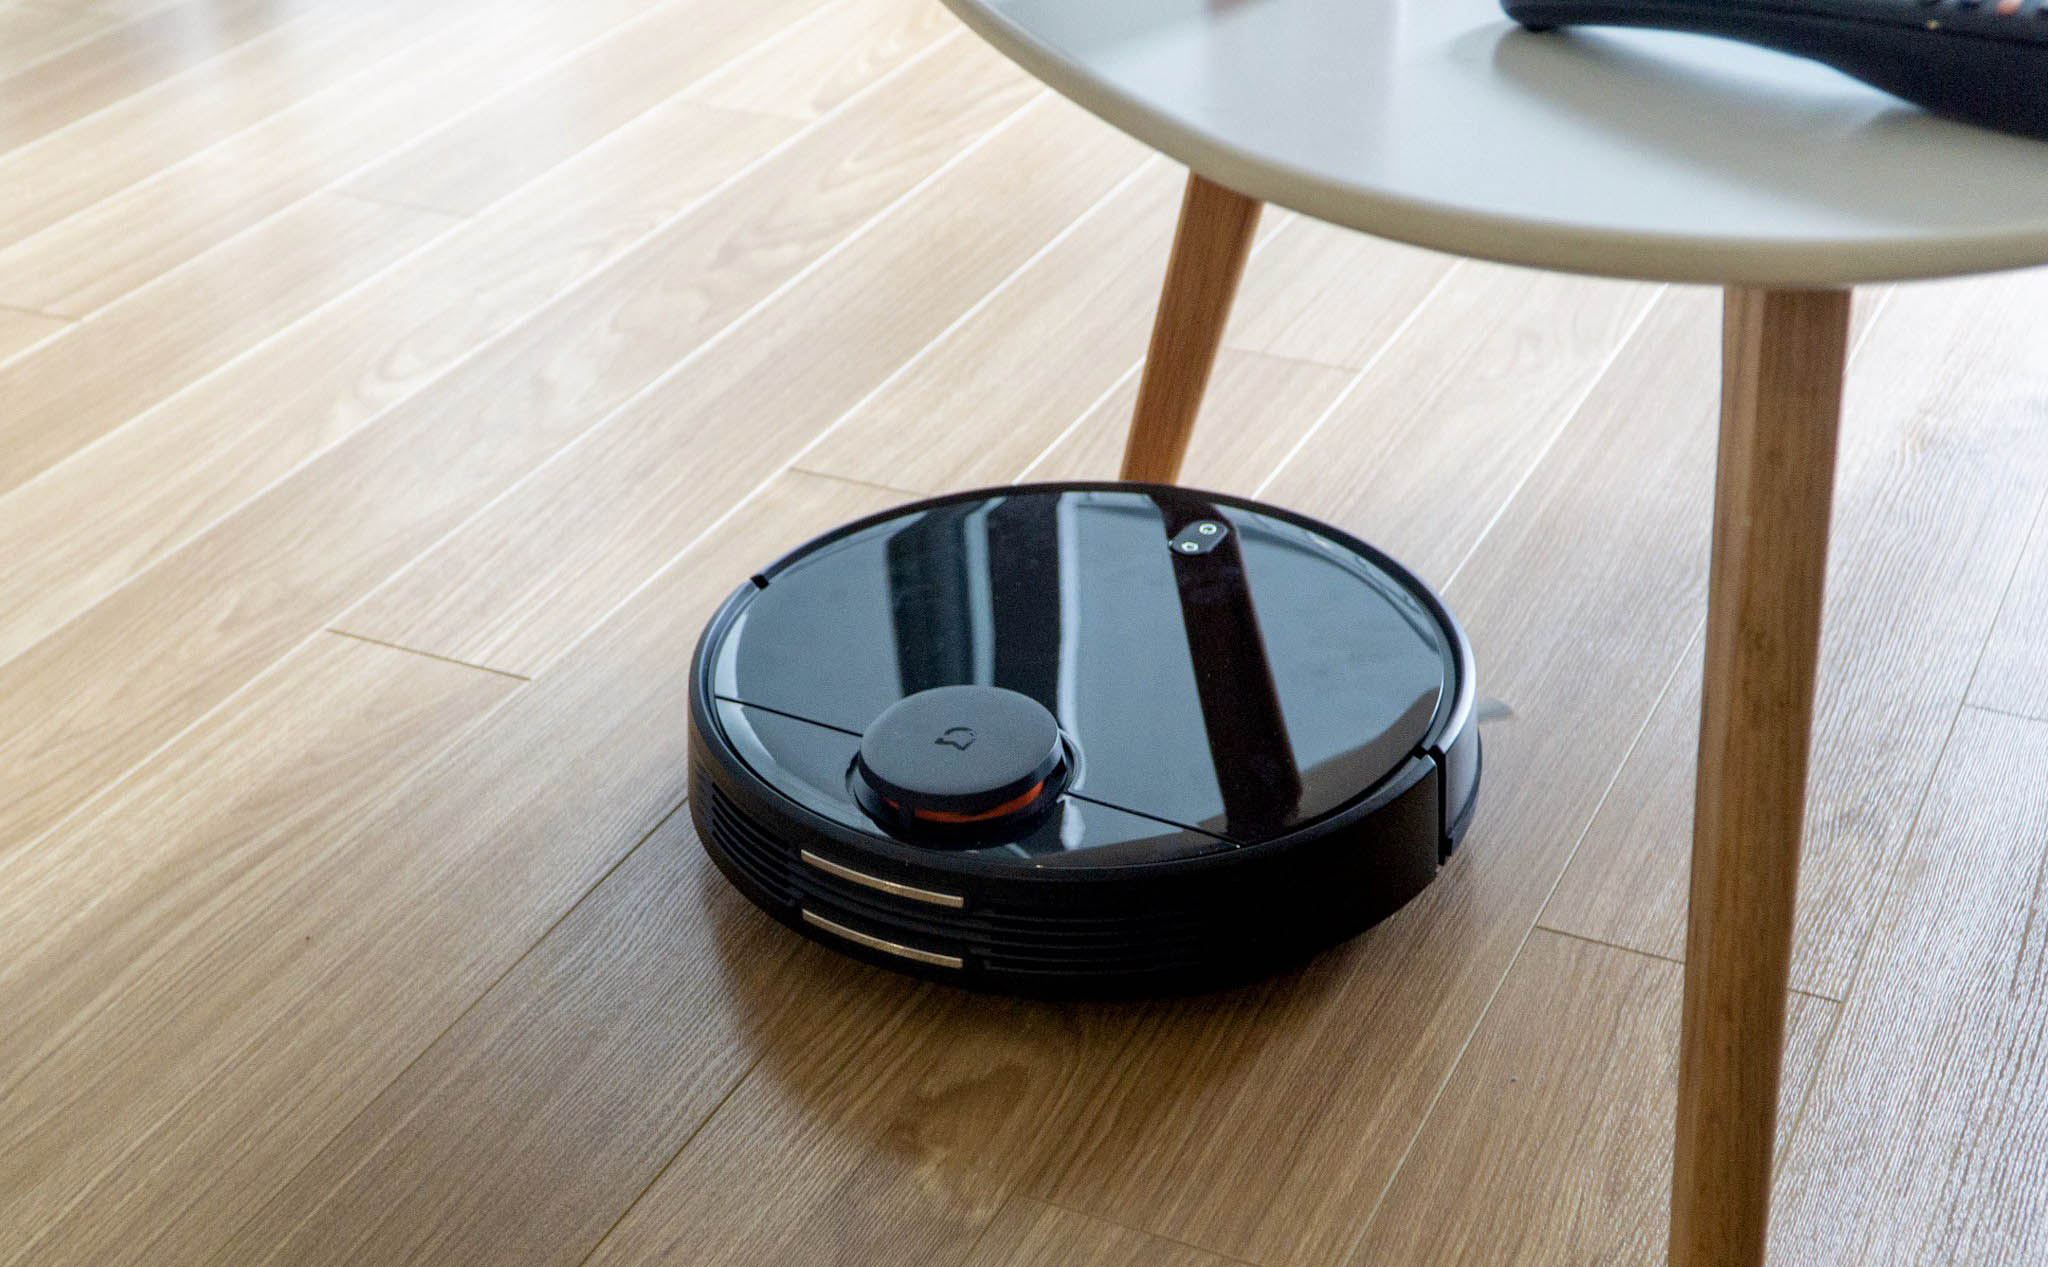 Robot hút bụi lau sàn Xiaomi Mijia Gen 2 - 2019 màu đen - STYTJ02YM